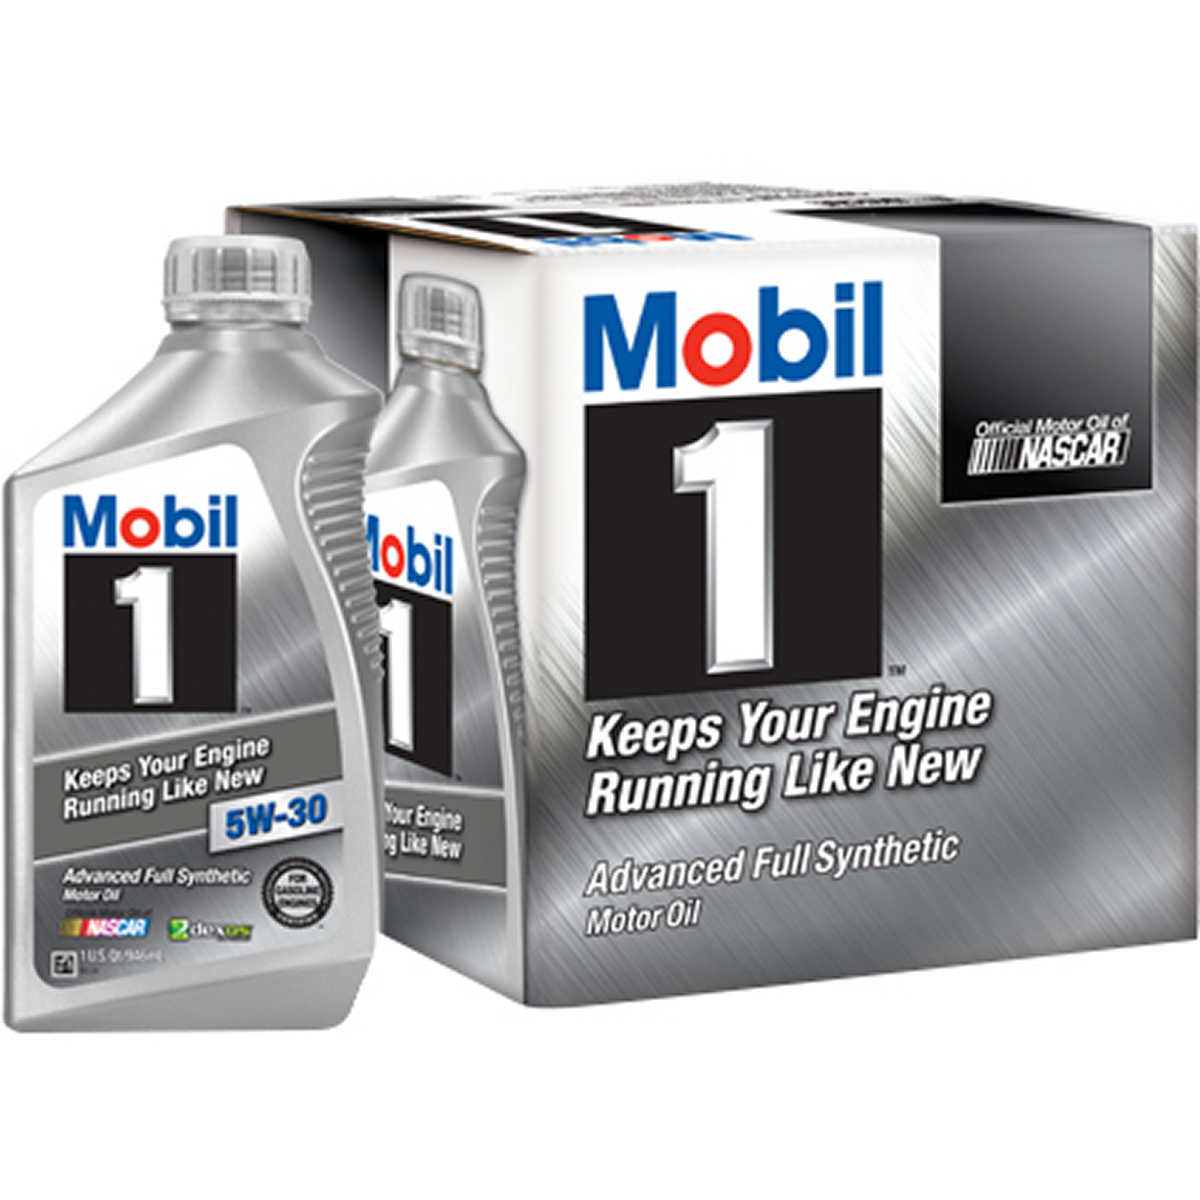 Mobil 1 advanced full synthetic motor oil 5w 30